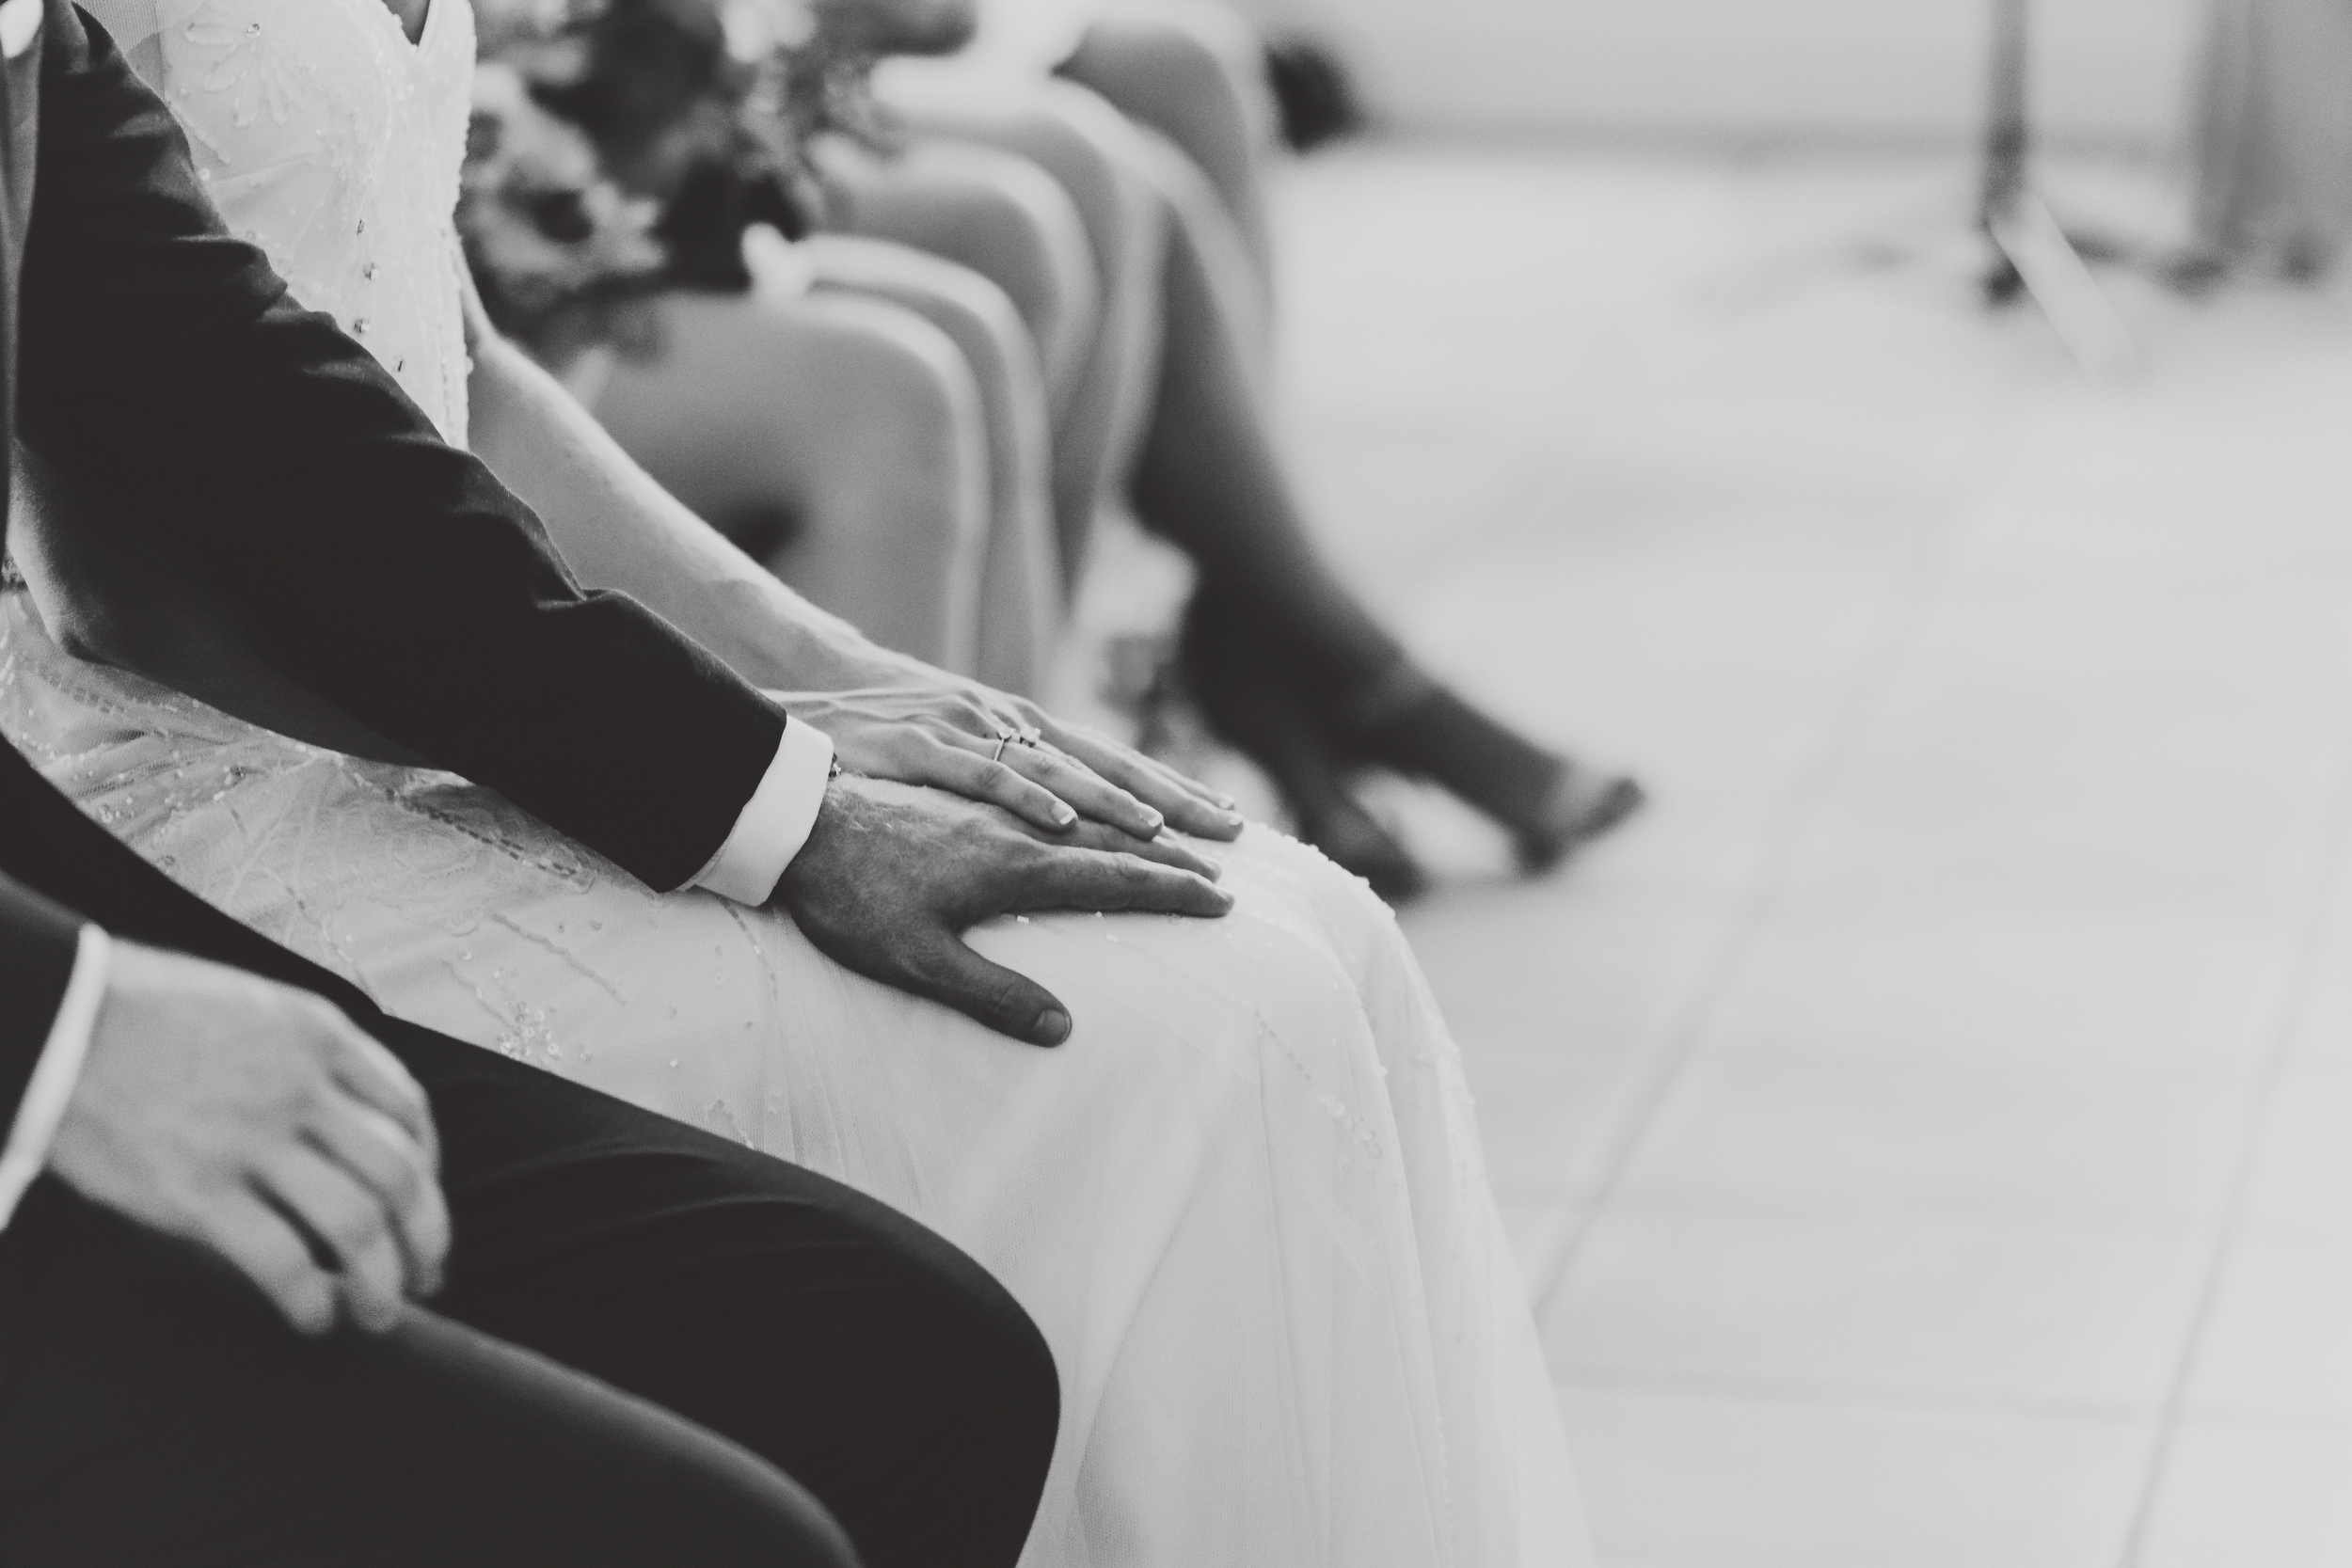 angie-diaz-photography-maui-wedding-mel-matt-41.jpeg